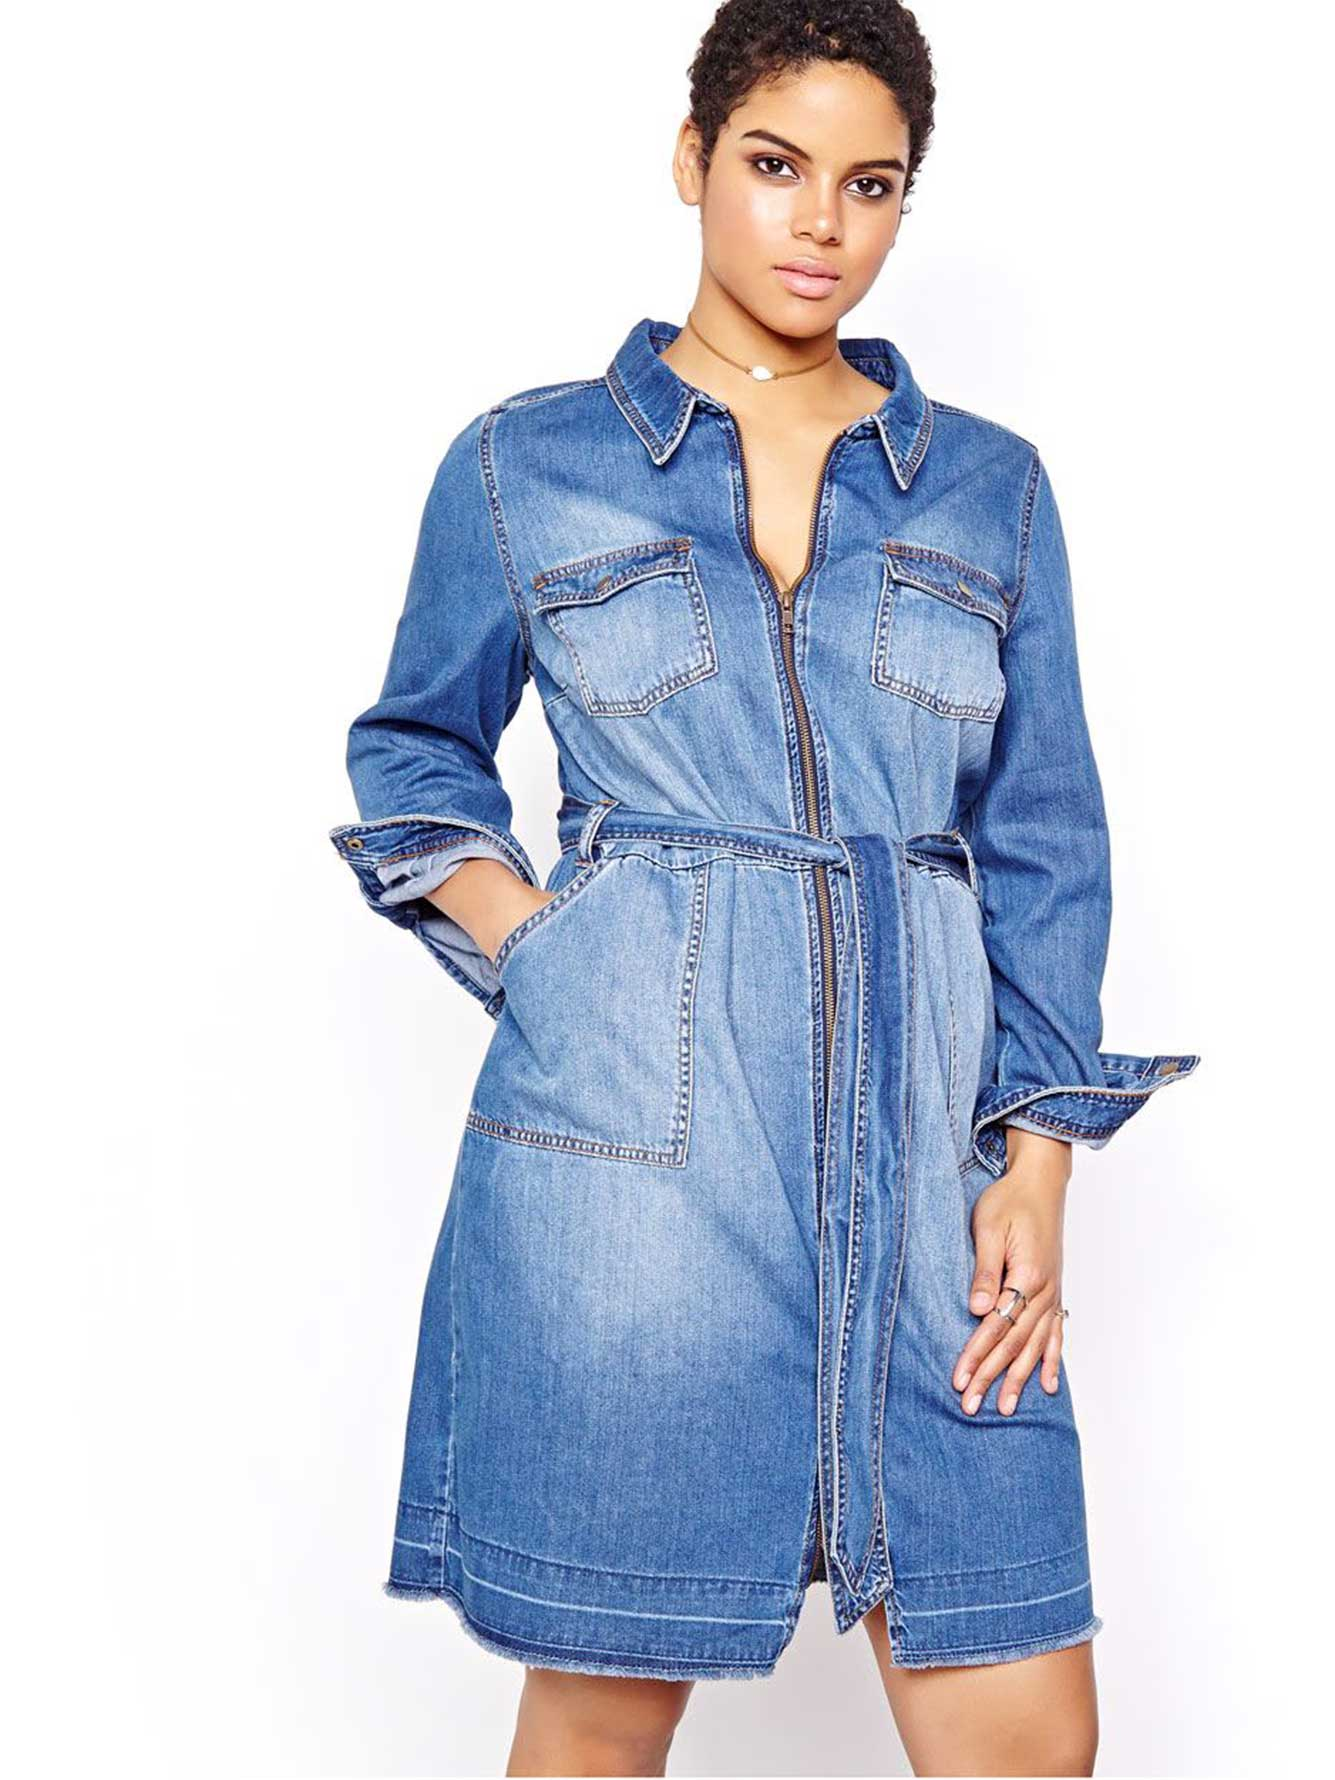 L&L Denim Shirt Dress | Addition Elle